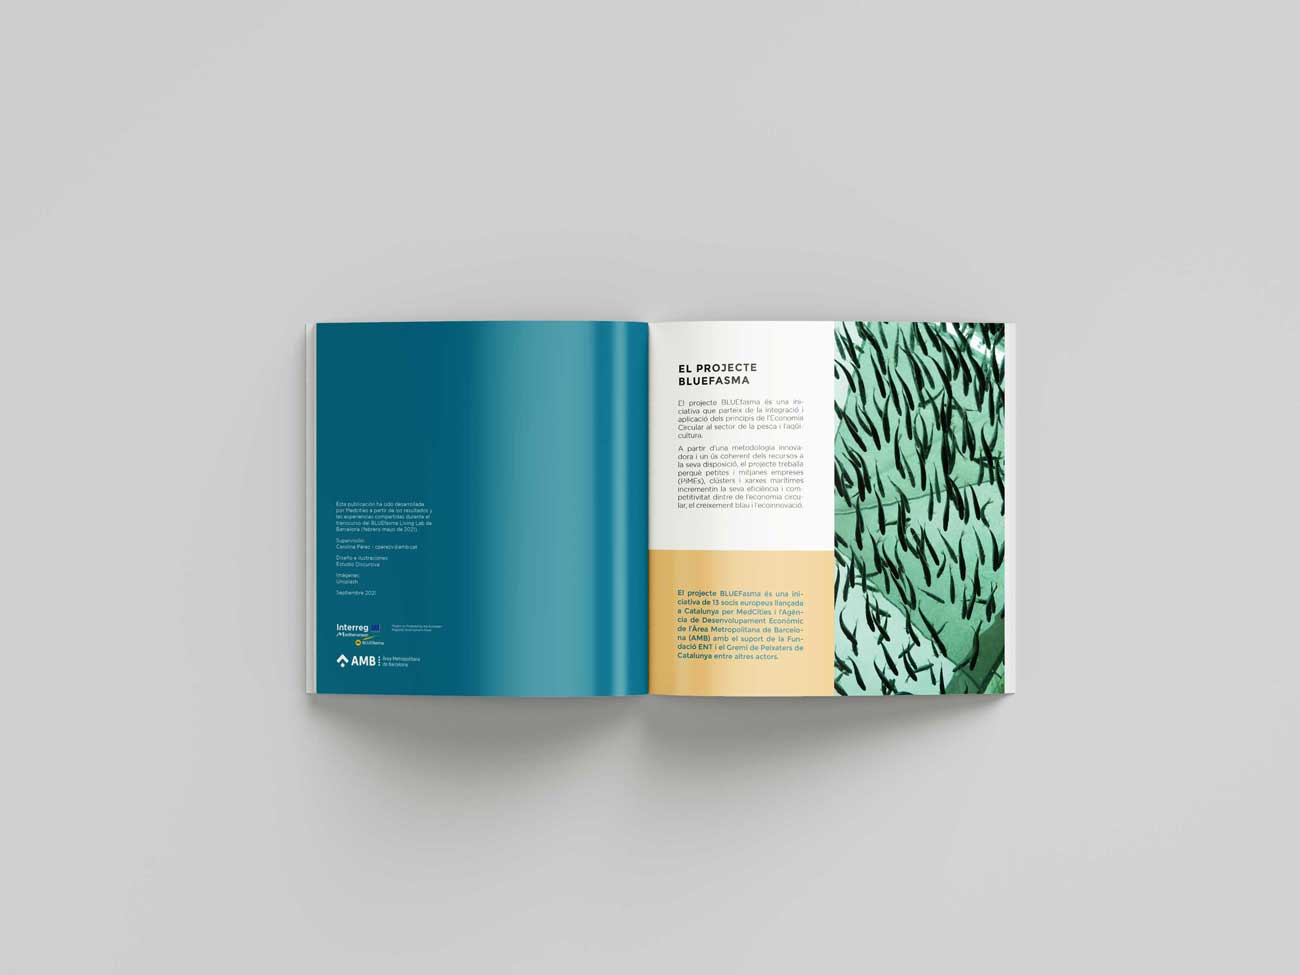 bluefasma living labs booklet sample